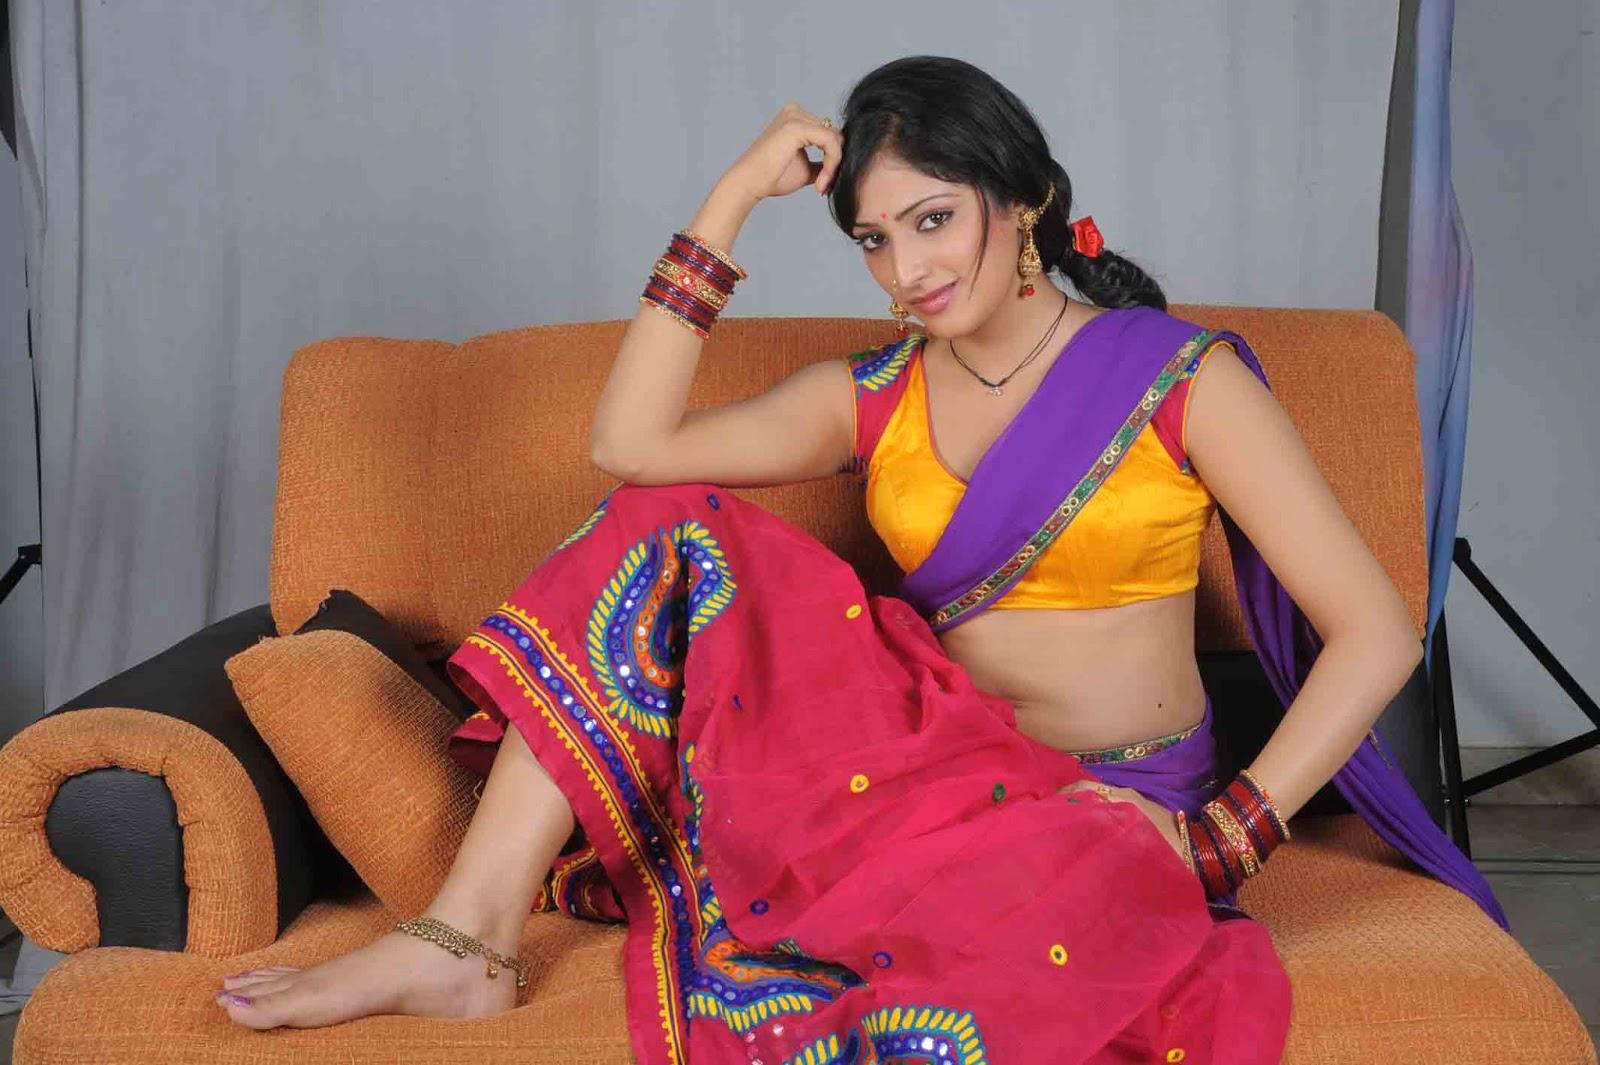 splendid sexy Hari priya naughty poses latest hot pics from acam